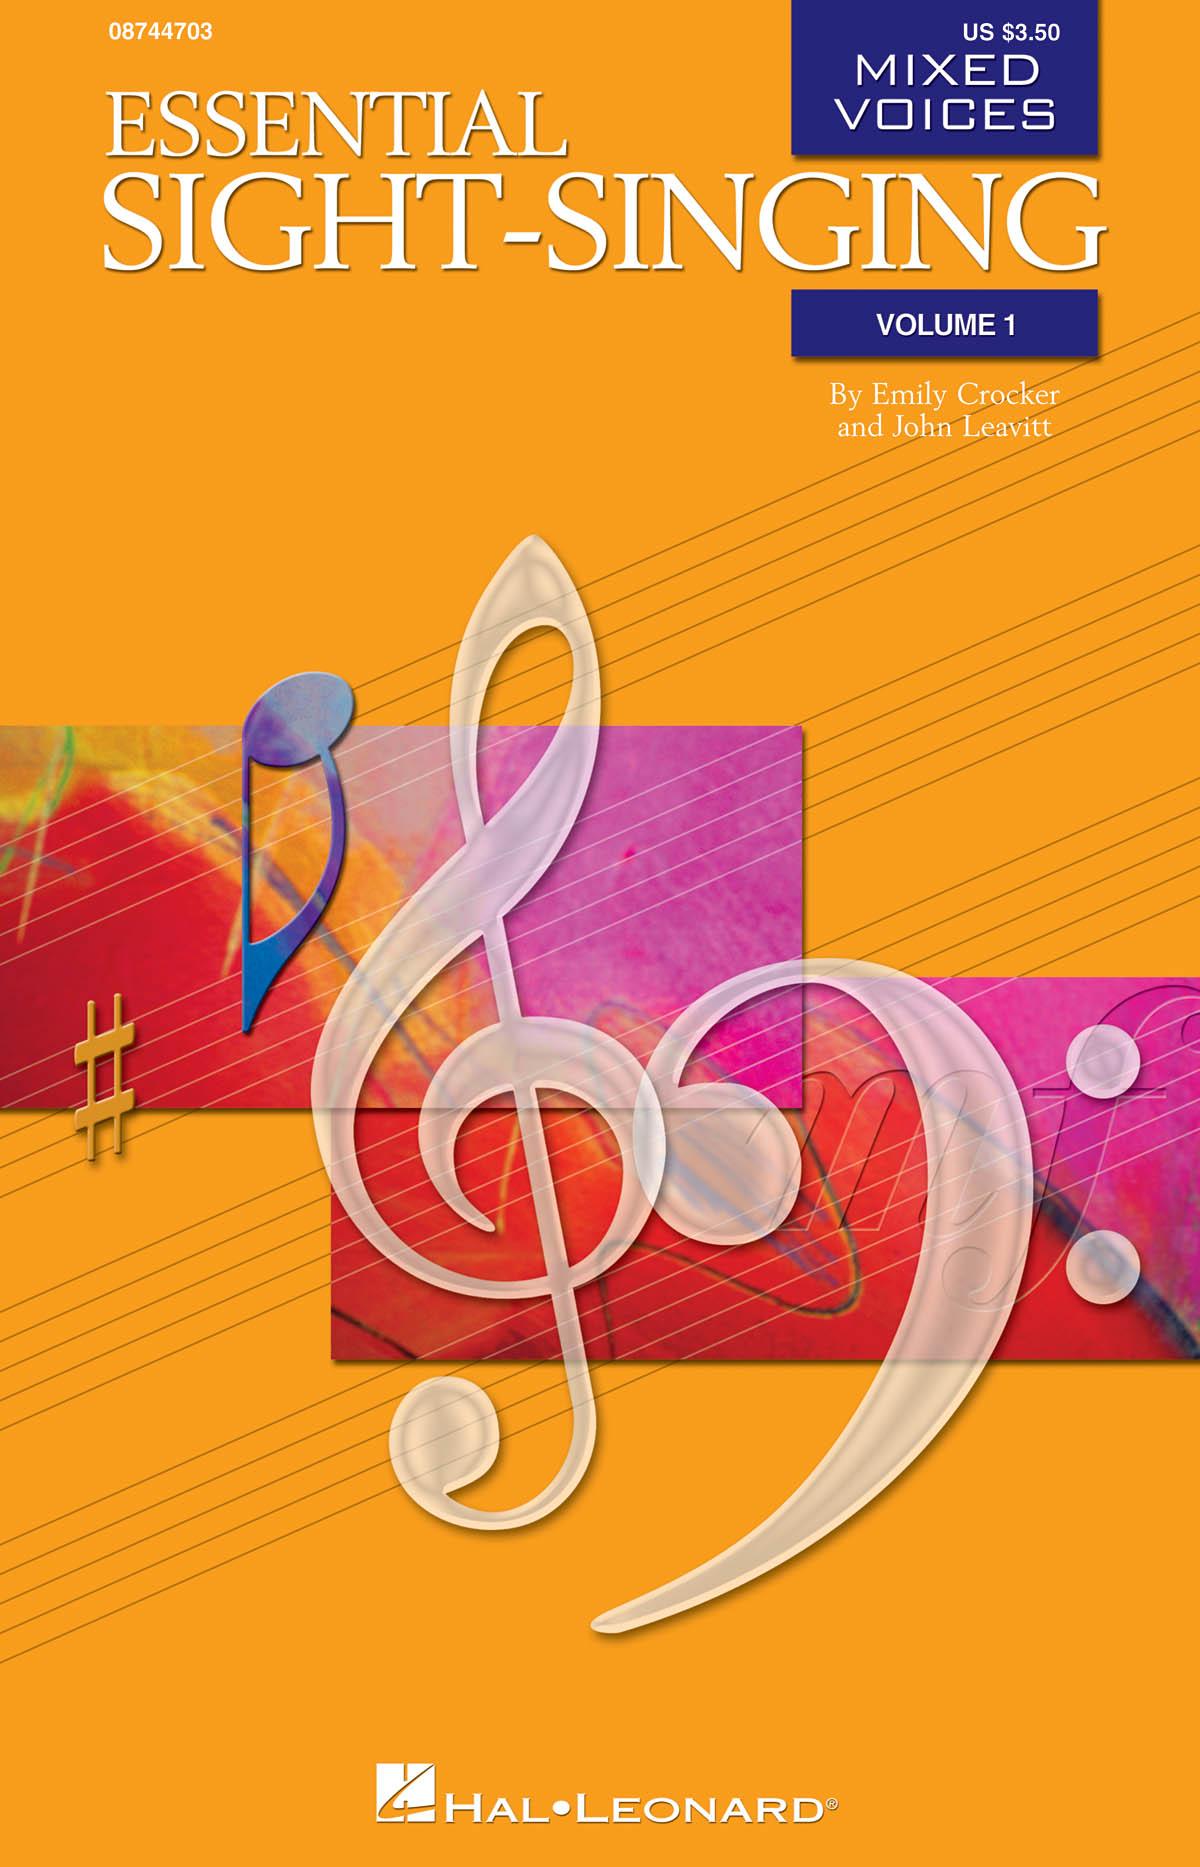 Essential Sight-Singing Vol. 1 Mixed Voices: SATB: Vocal Score